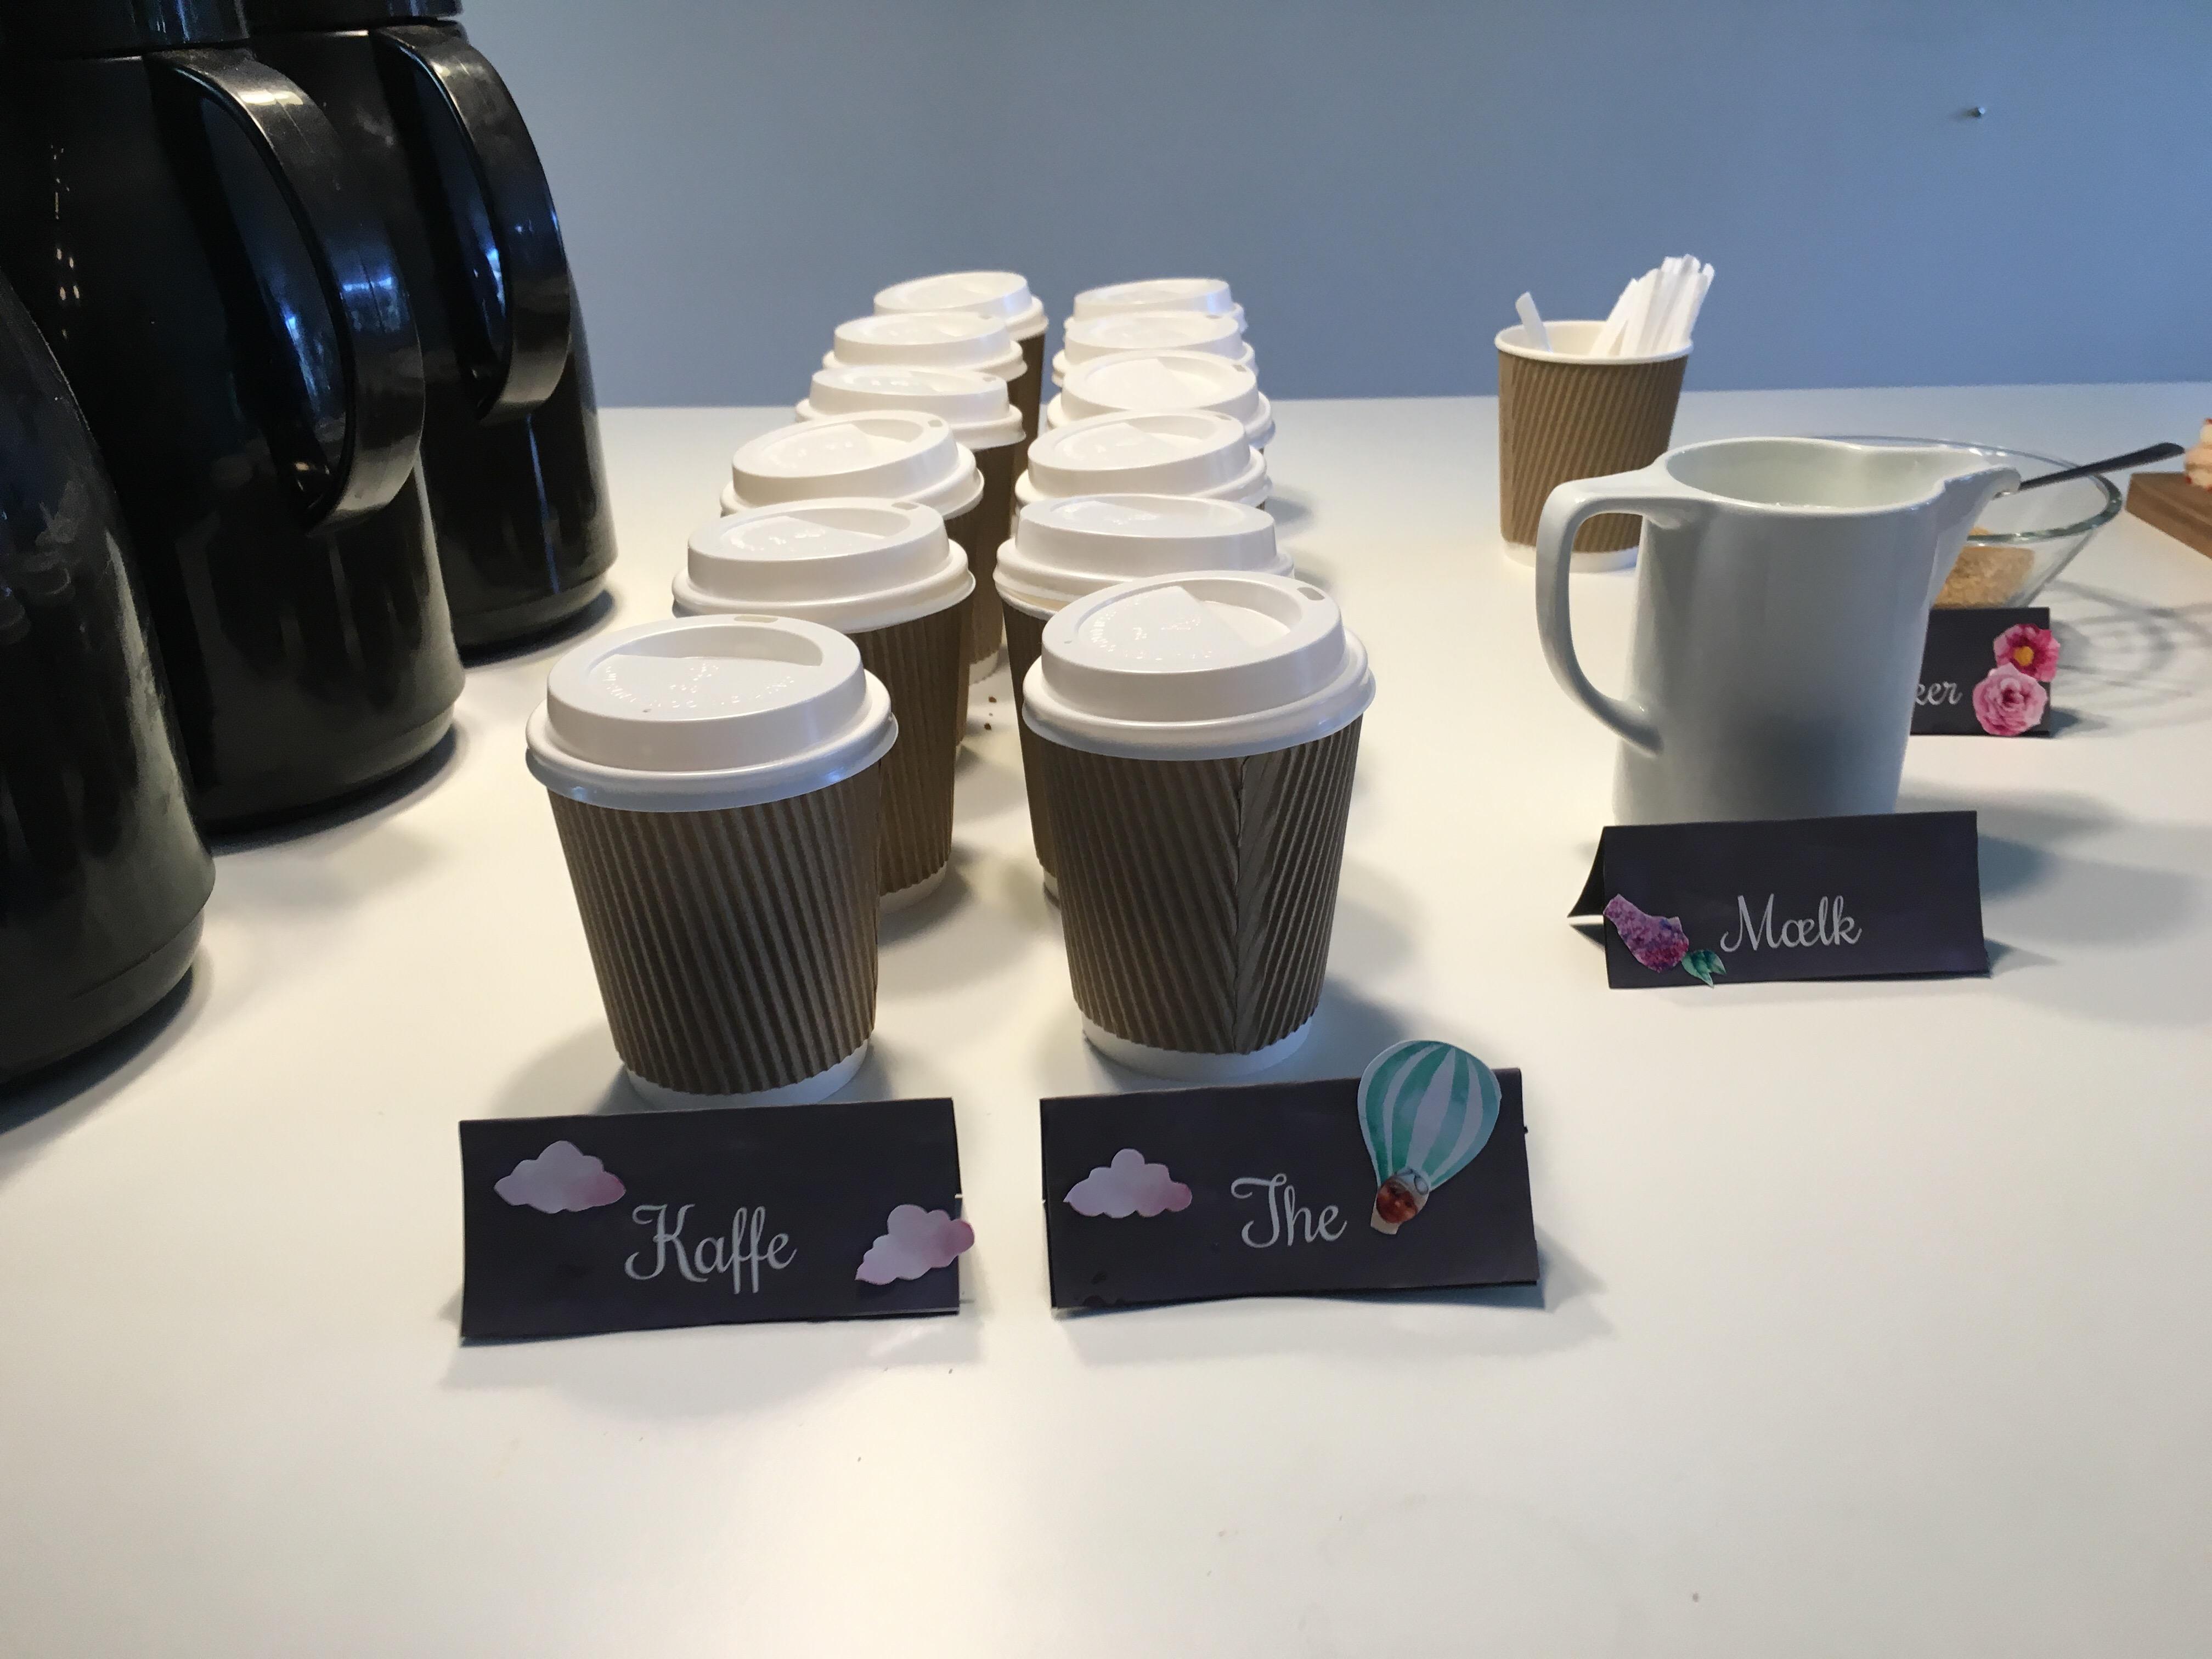 tag selv kaffe barnedåb